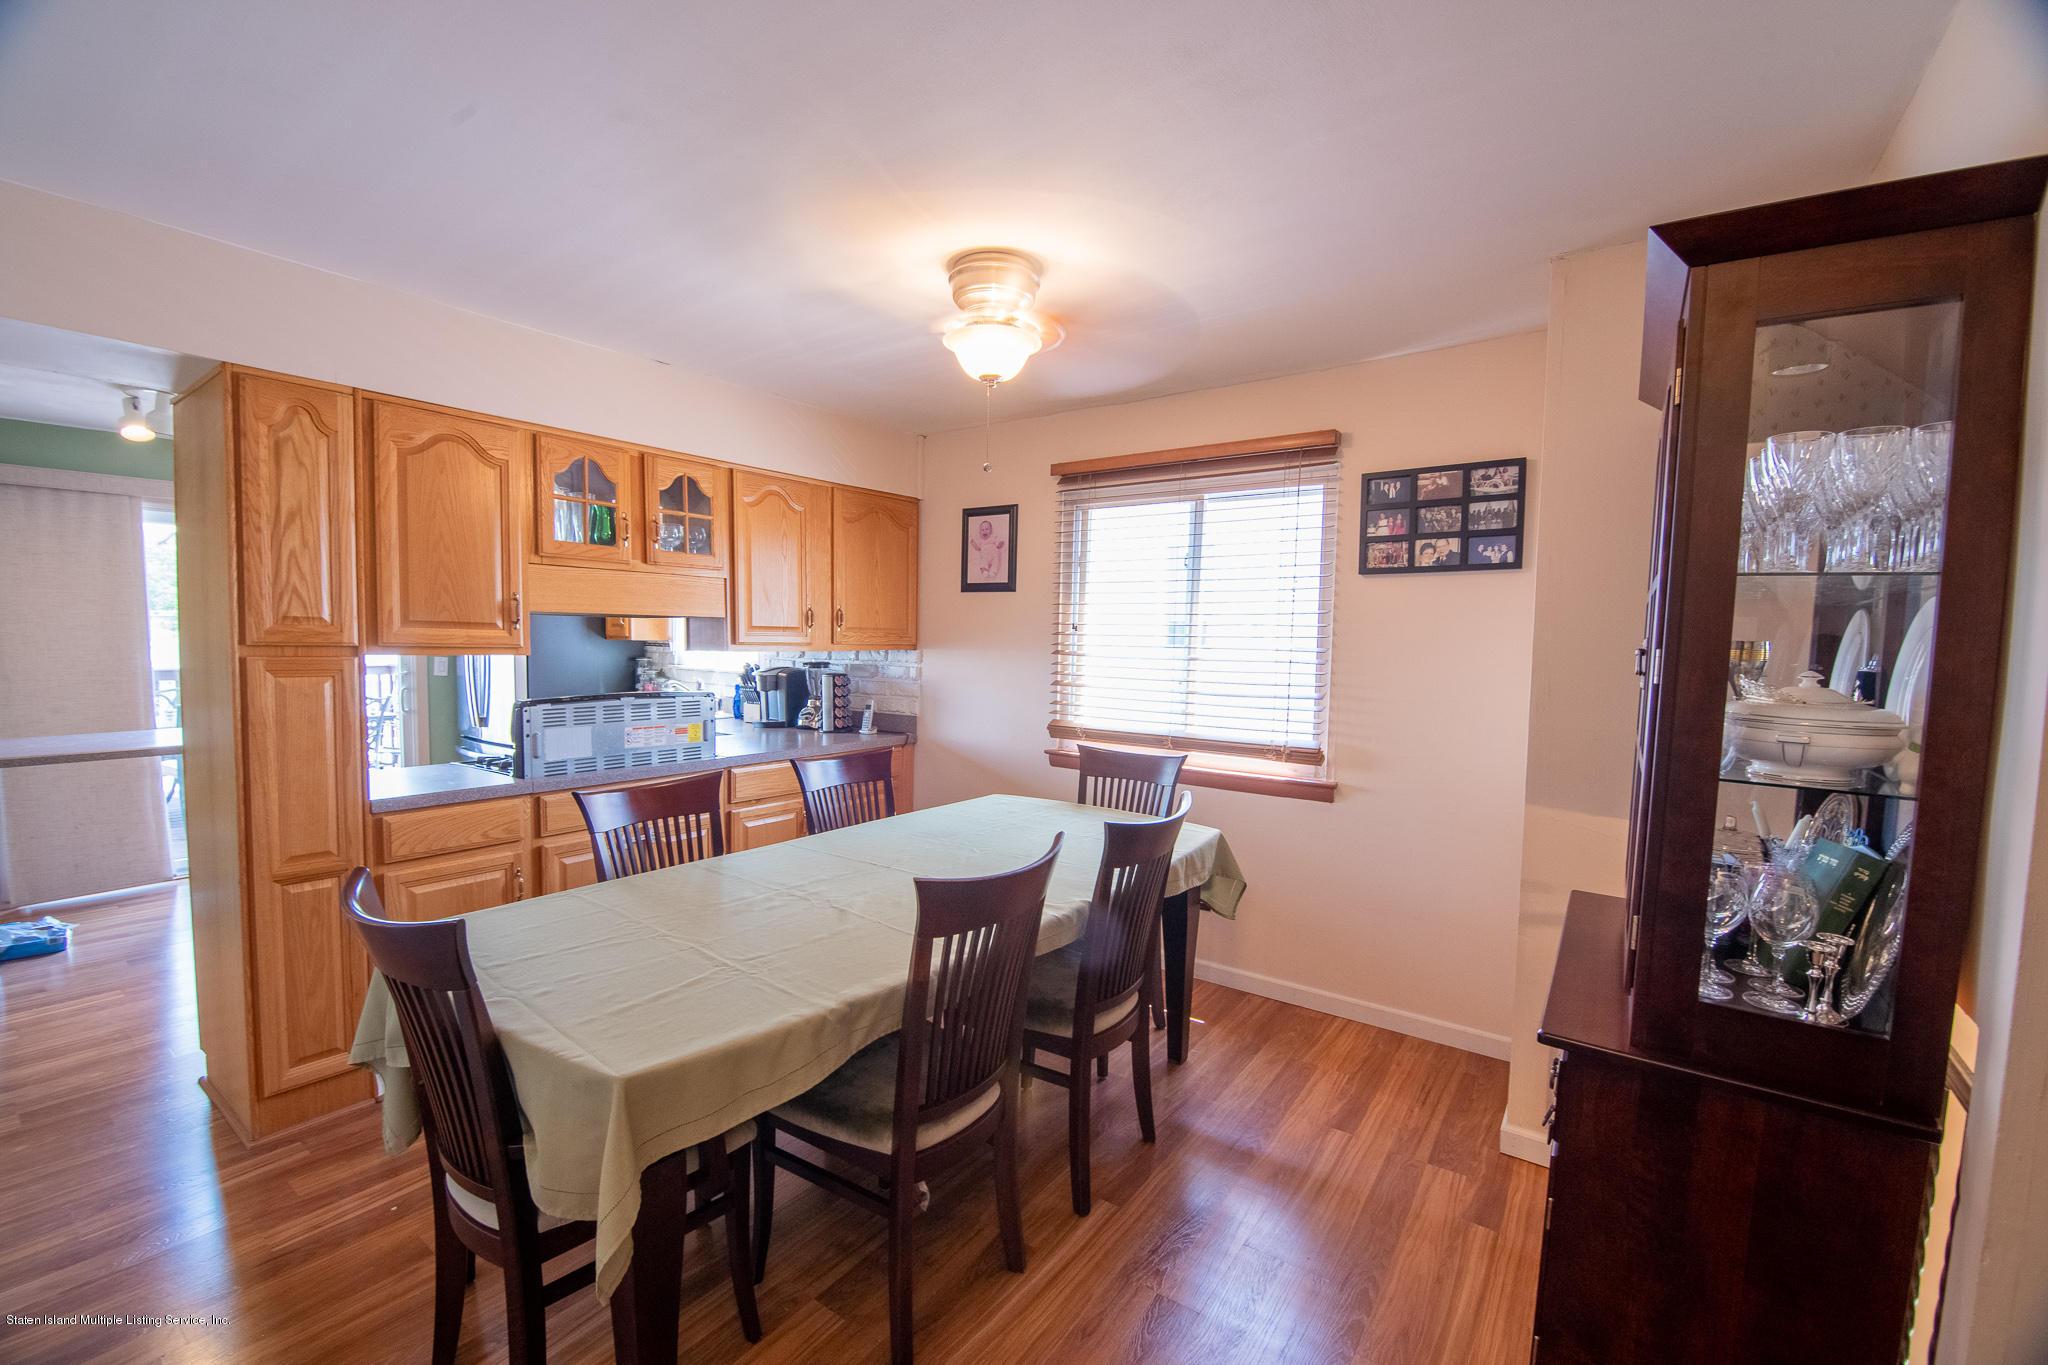 Single Family - Semi-Attached 337 Brookfield Avenue  Staten Island, NY 10308, MLS-1131002-8